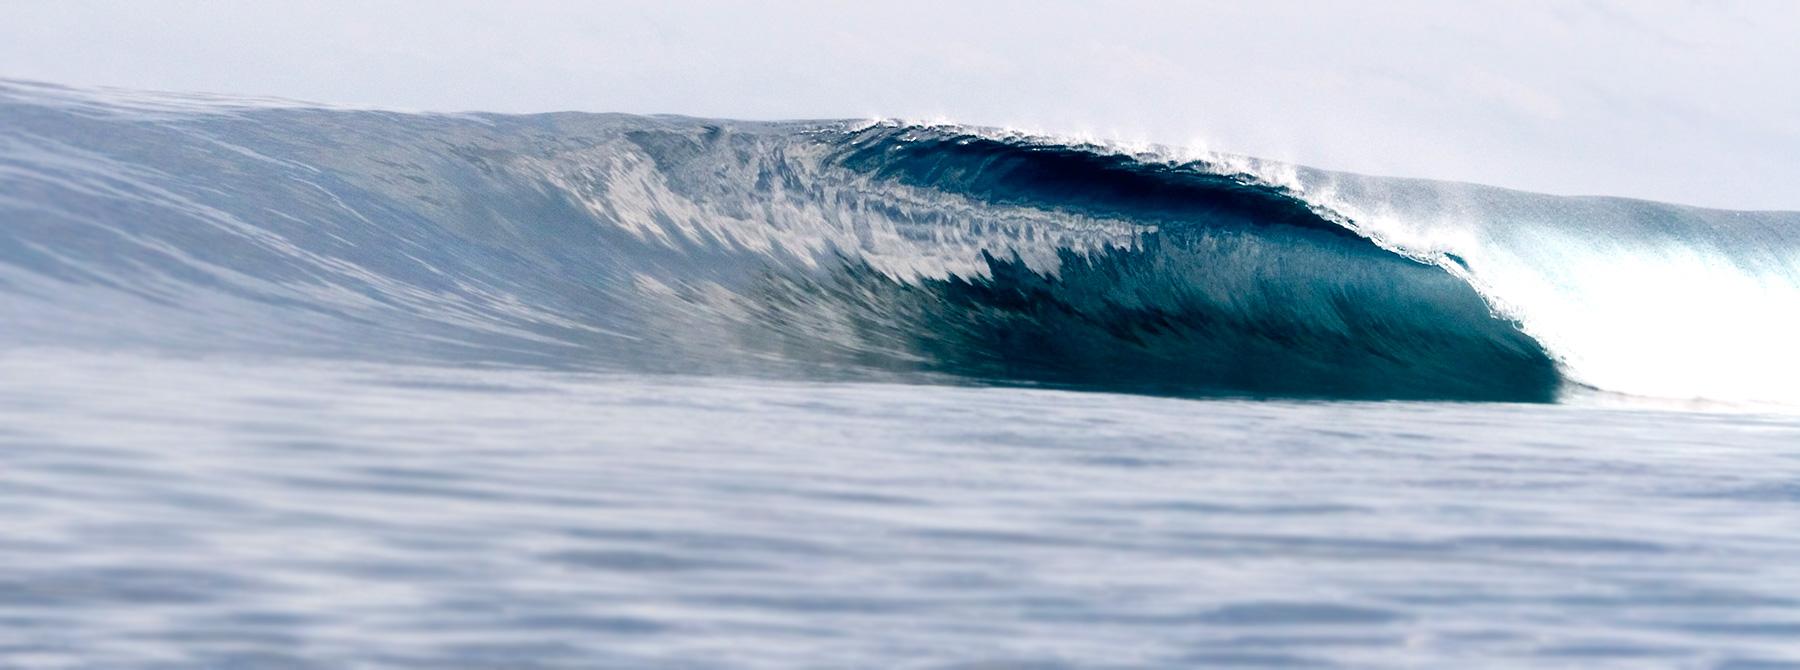 Fiji Asia Pacific Superyachts